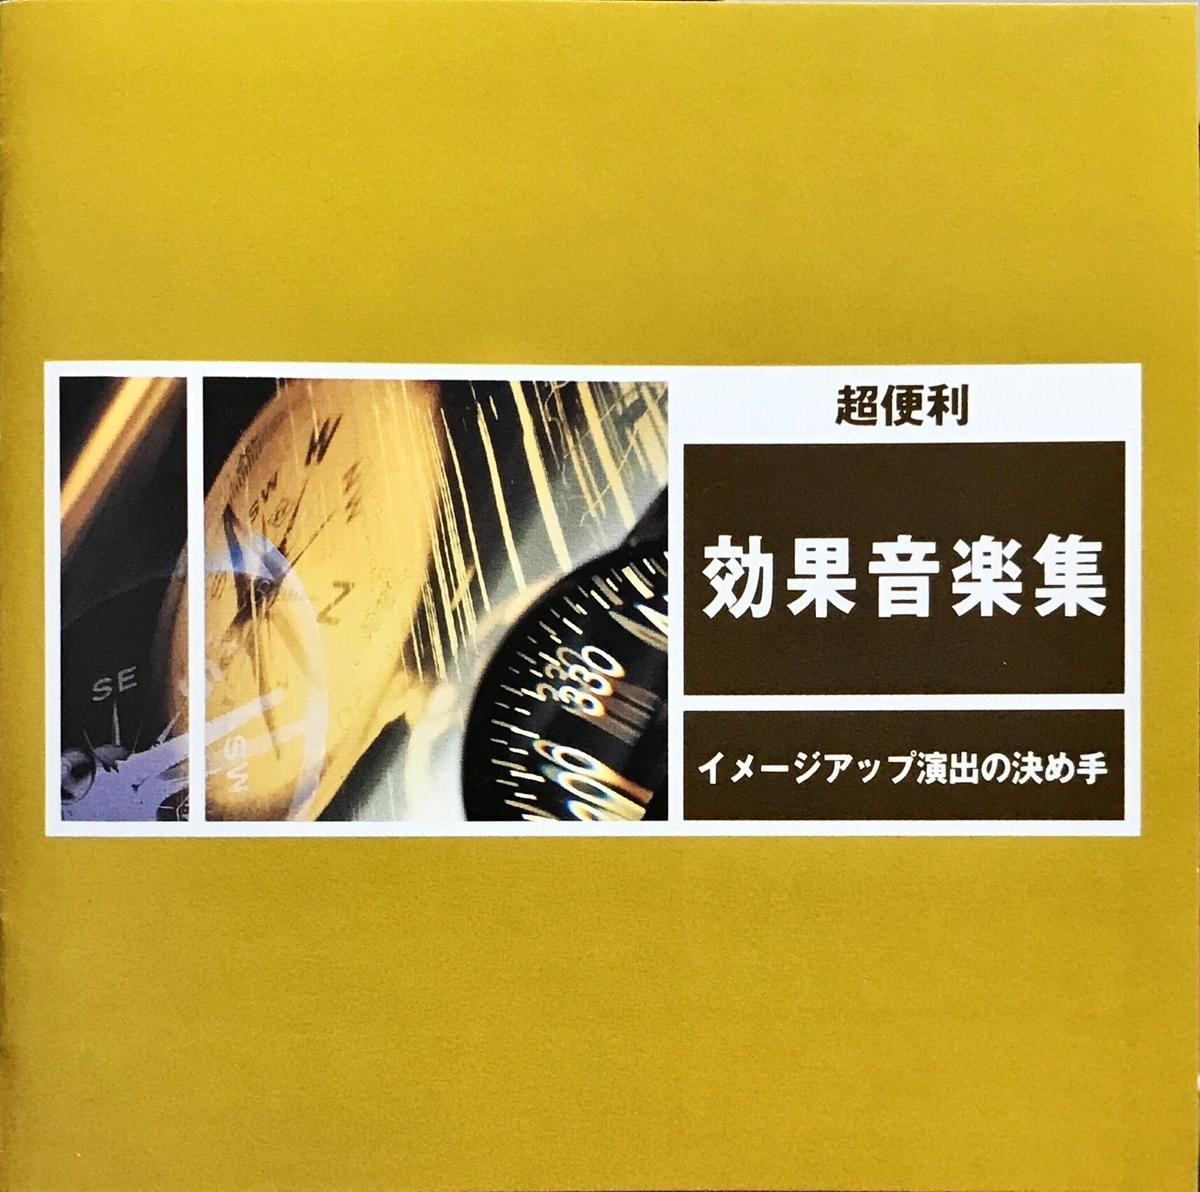 f:id:shibasakiyuji:20190602120733j:plain